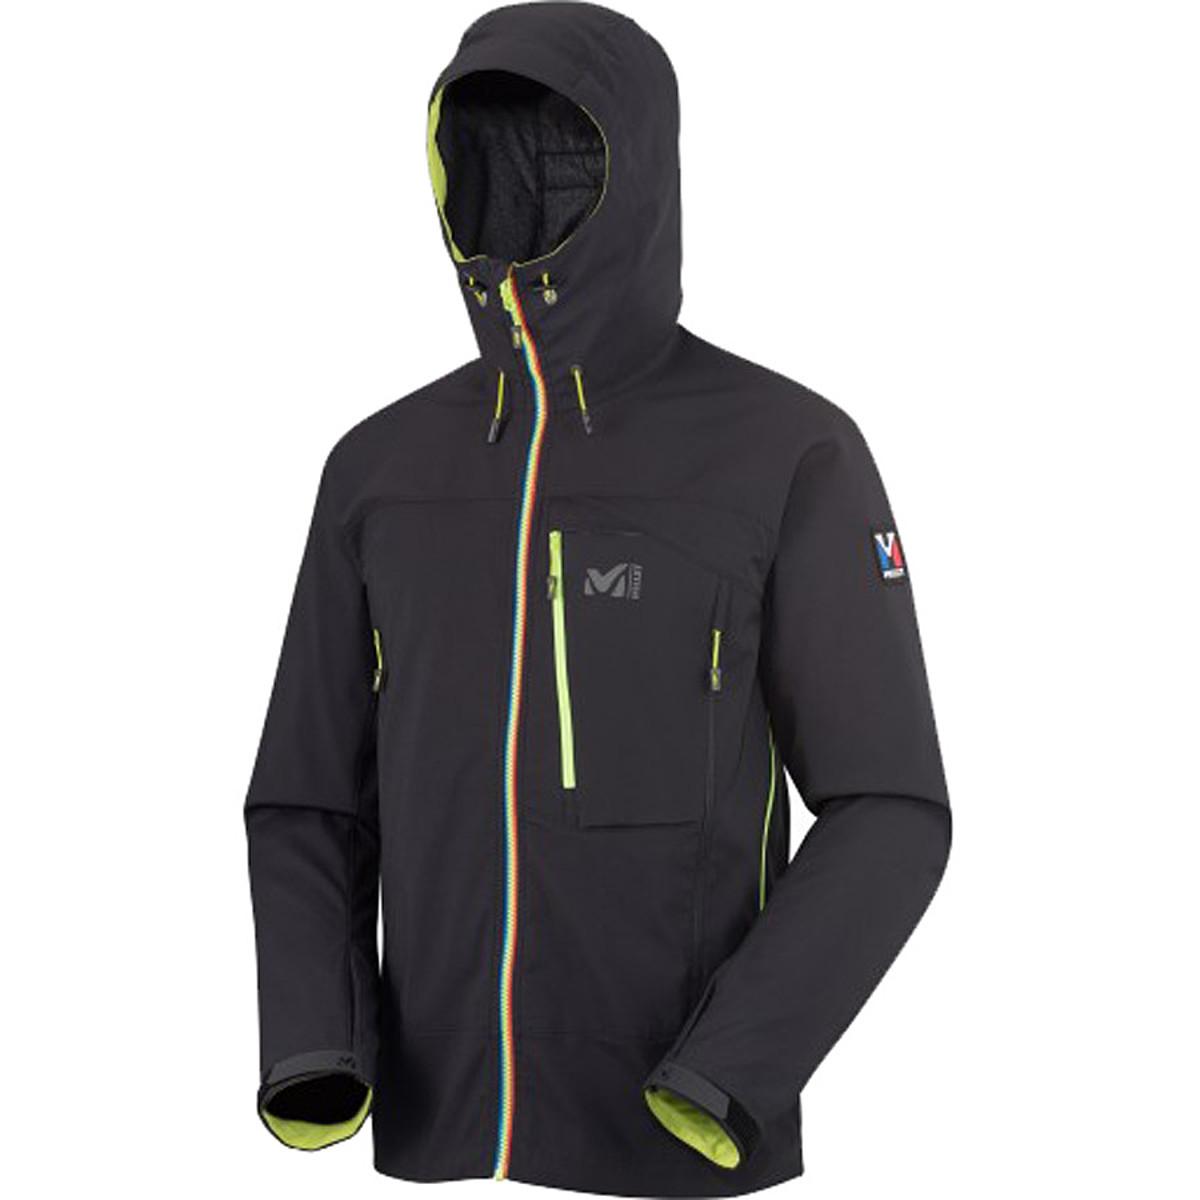 Millet Trilogy WDS Storm Jacket